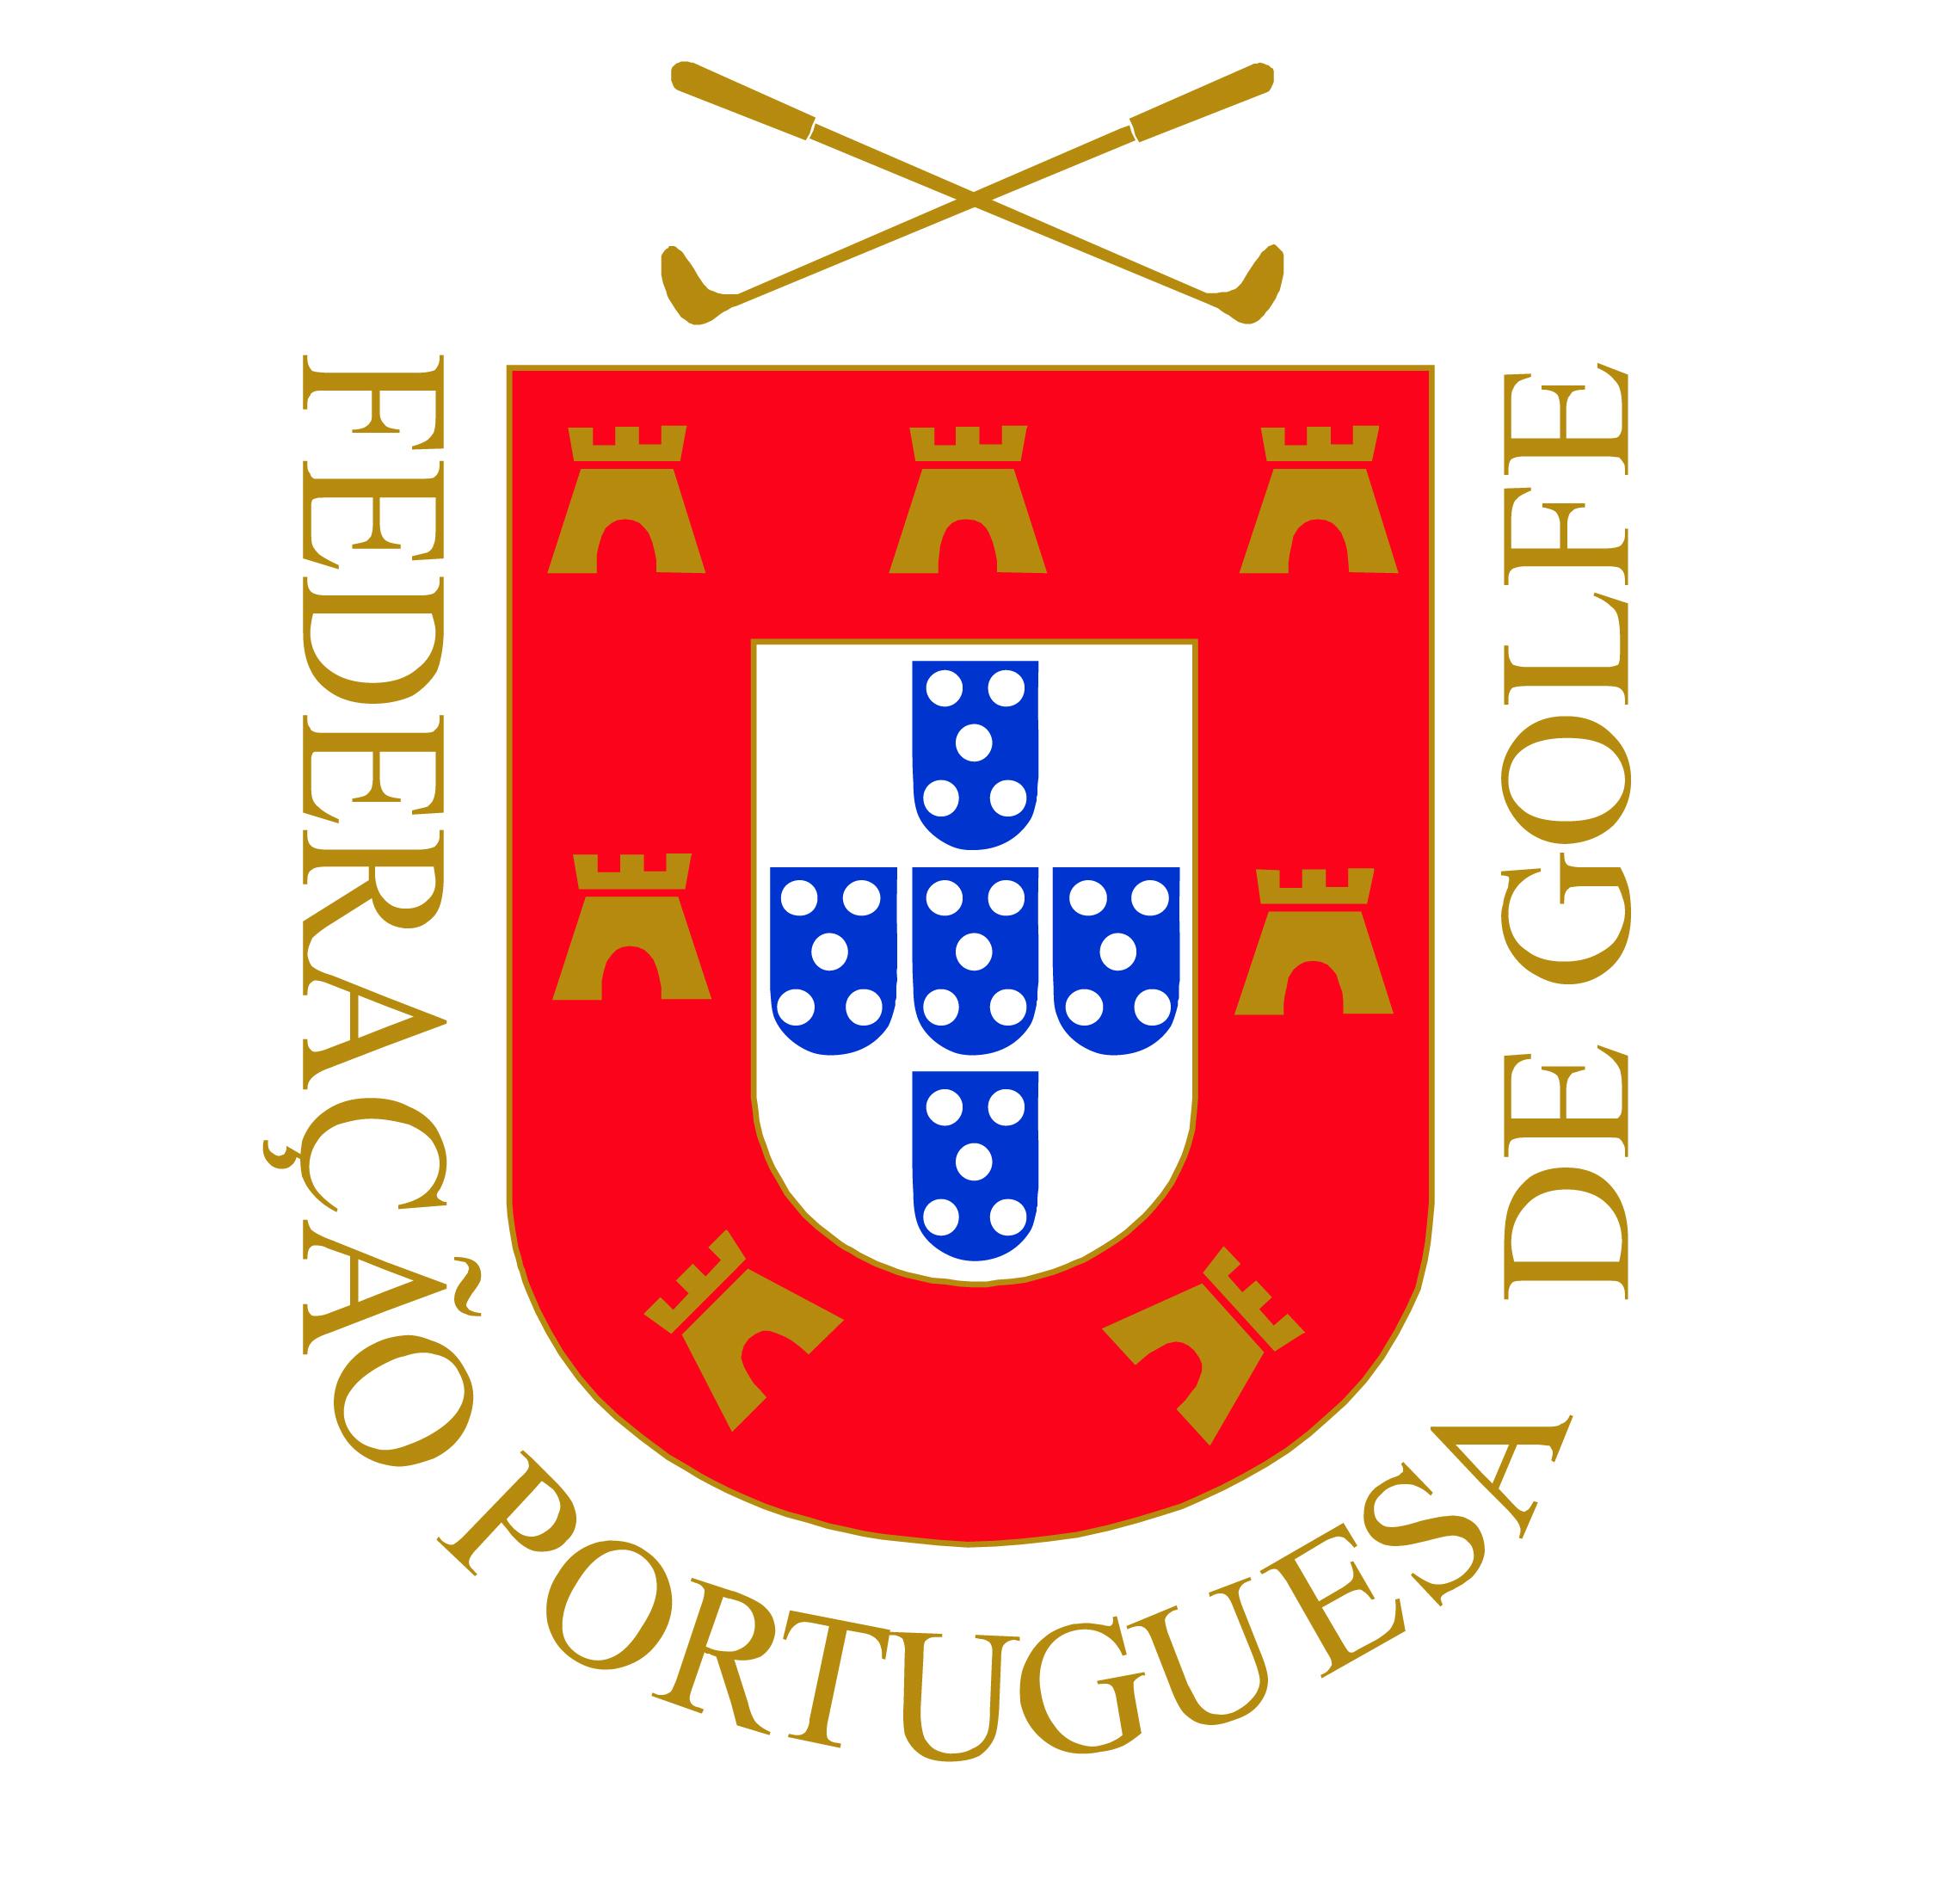 COVID-19: MEDIDAS GOVERNAMENTAIS DE APOIO AOS TRABALHADORES INDEPENDENTES